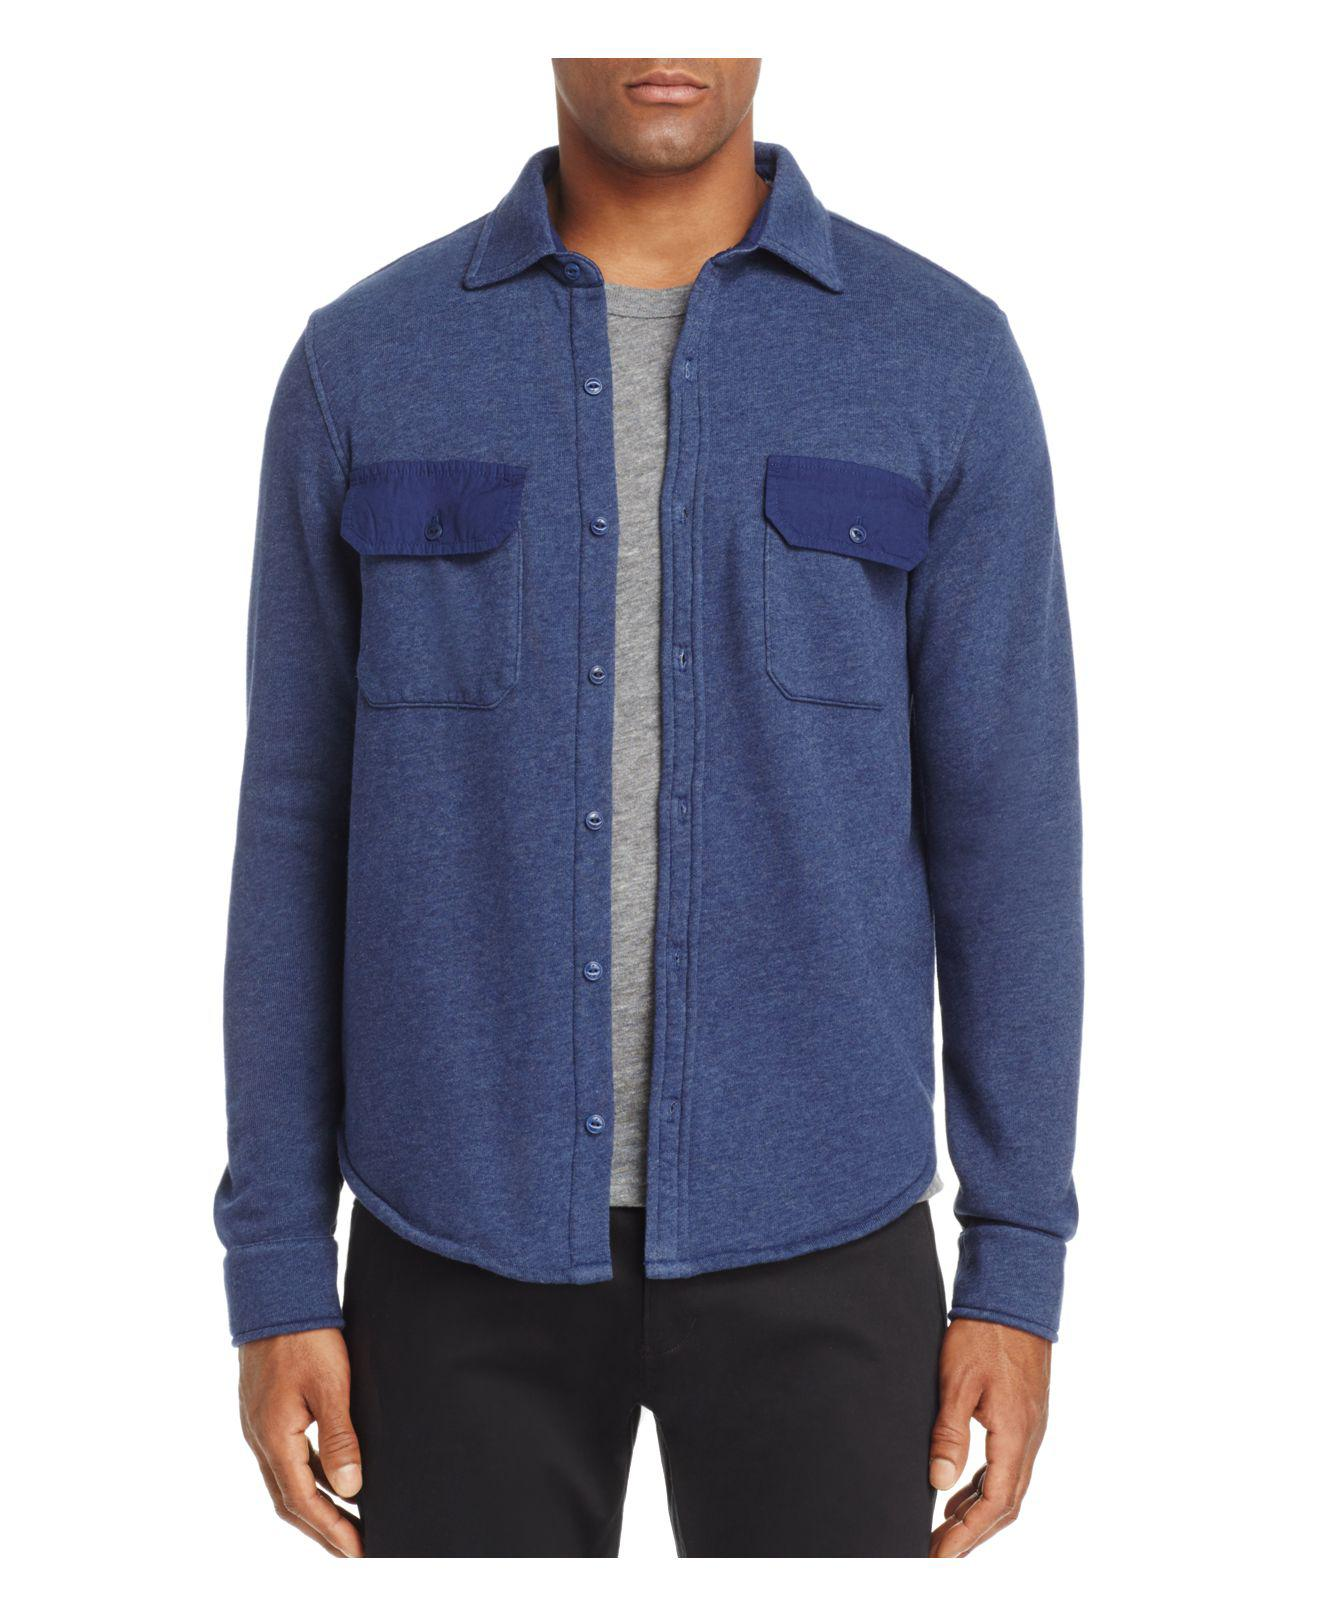 Lyst Goodlife Shirt Jacket In Blue For Men